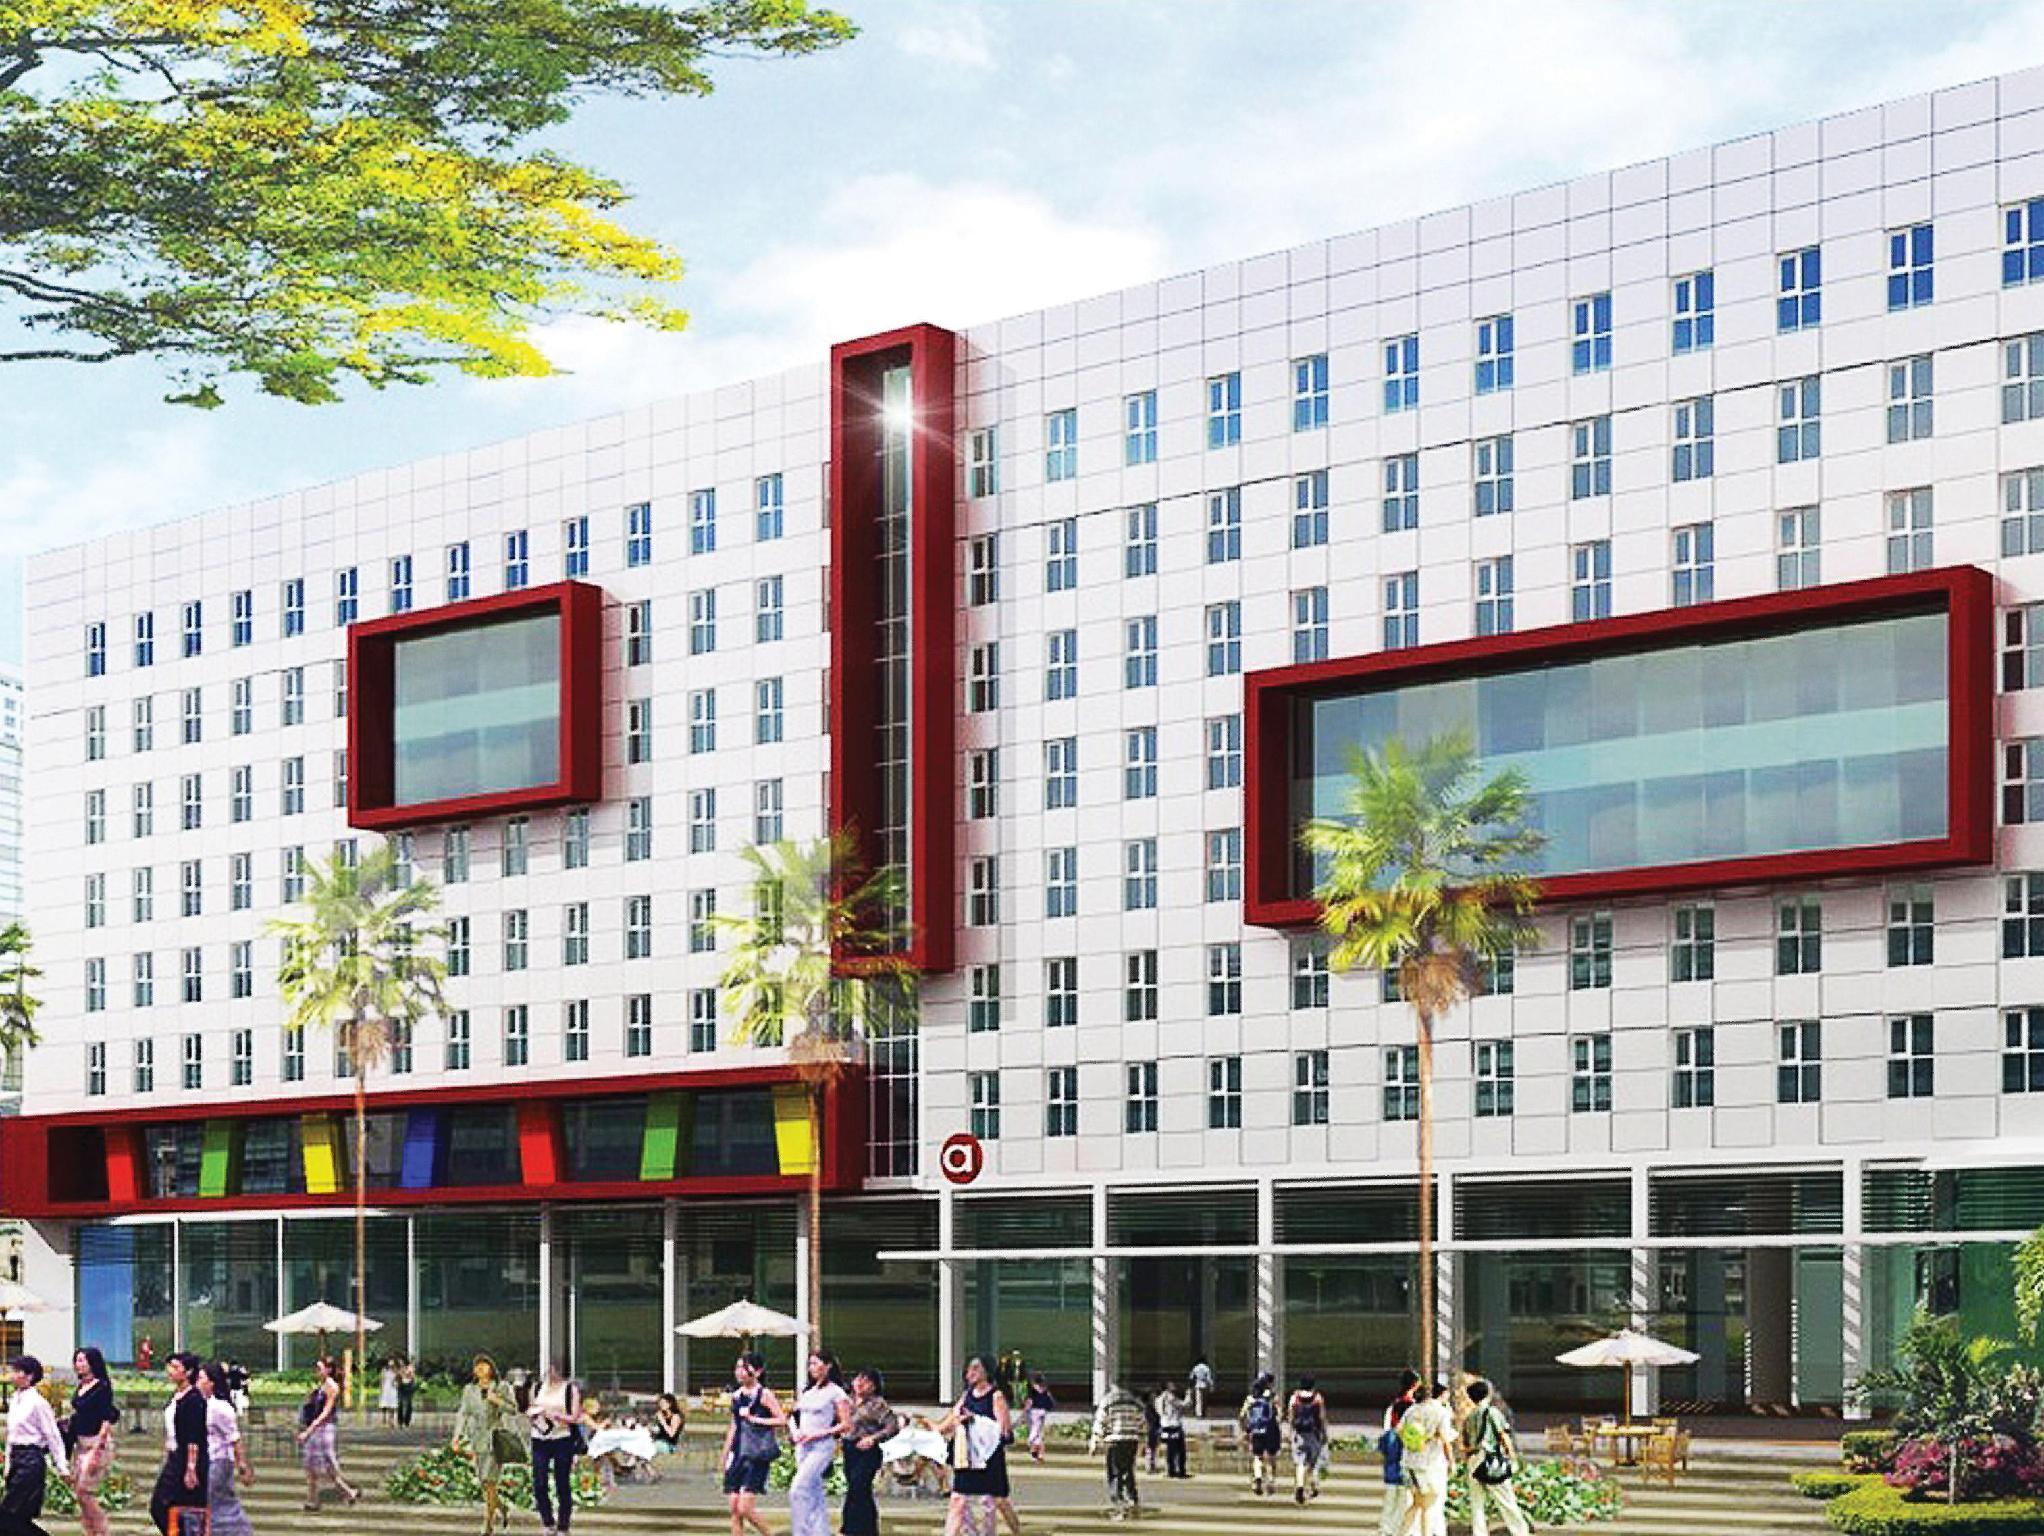 Hotel Amaris Hotel Tangerang - Tangcity Superblok, Jl. Jenderal Sudriman No. 1 - Tangerang